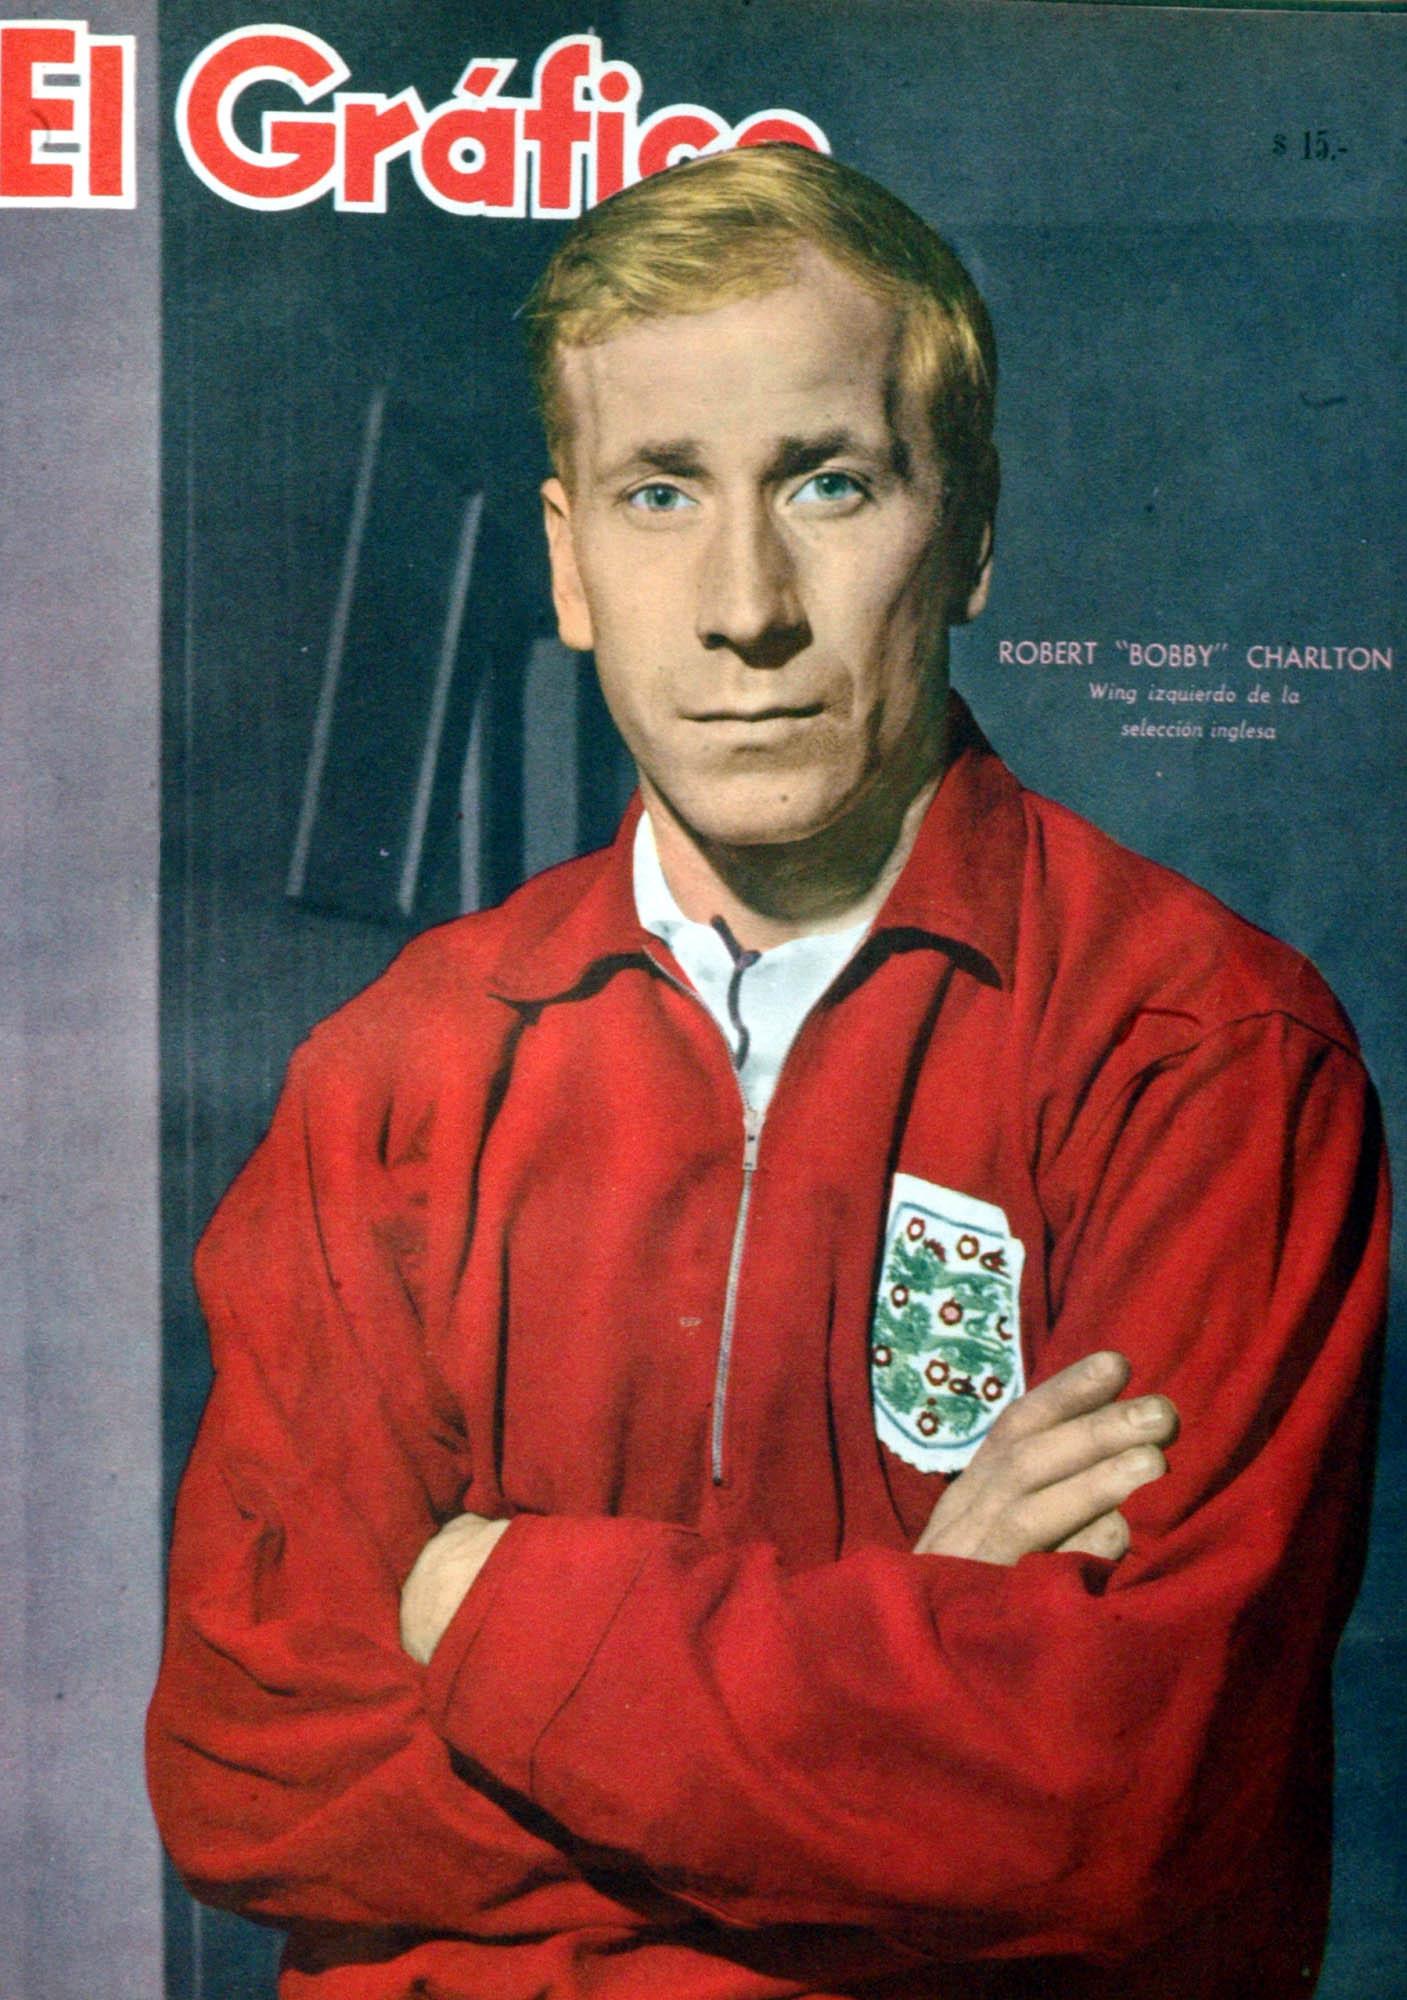 File:Bobby Charlton (Inglaterra) - El Gráfico 2229.jpg